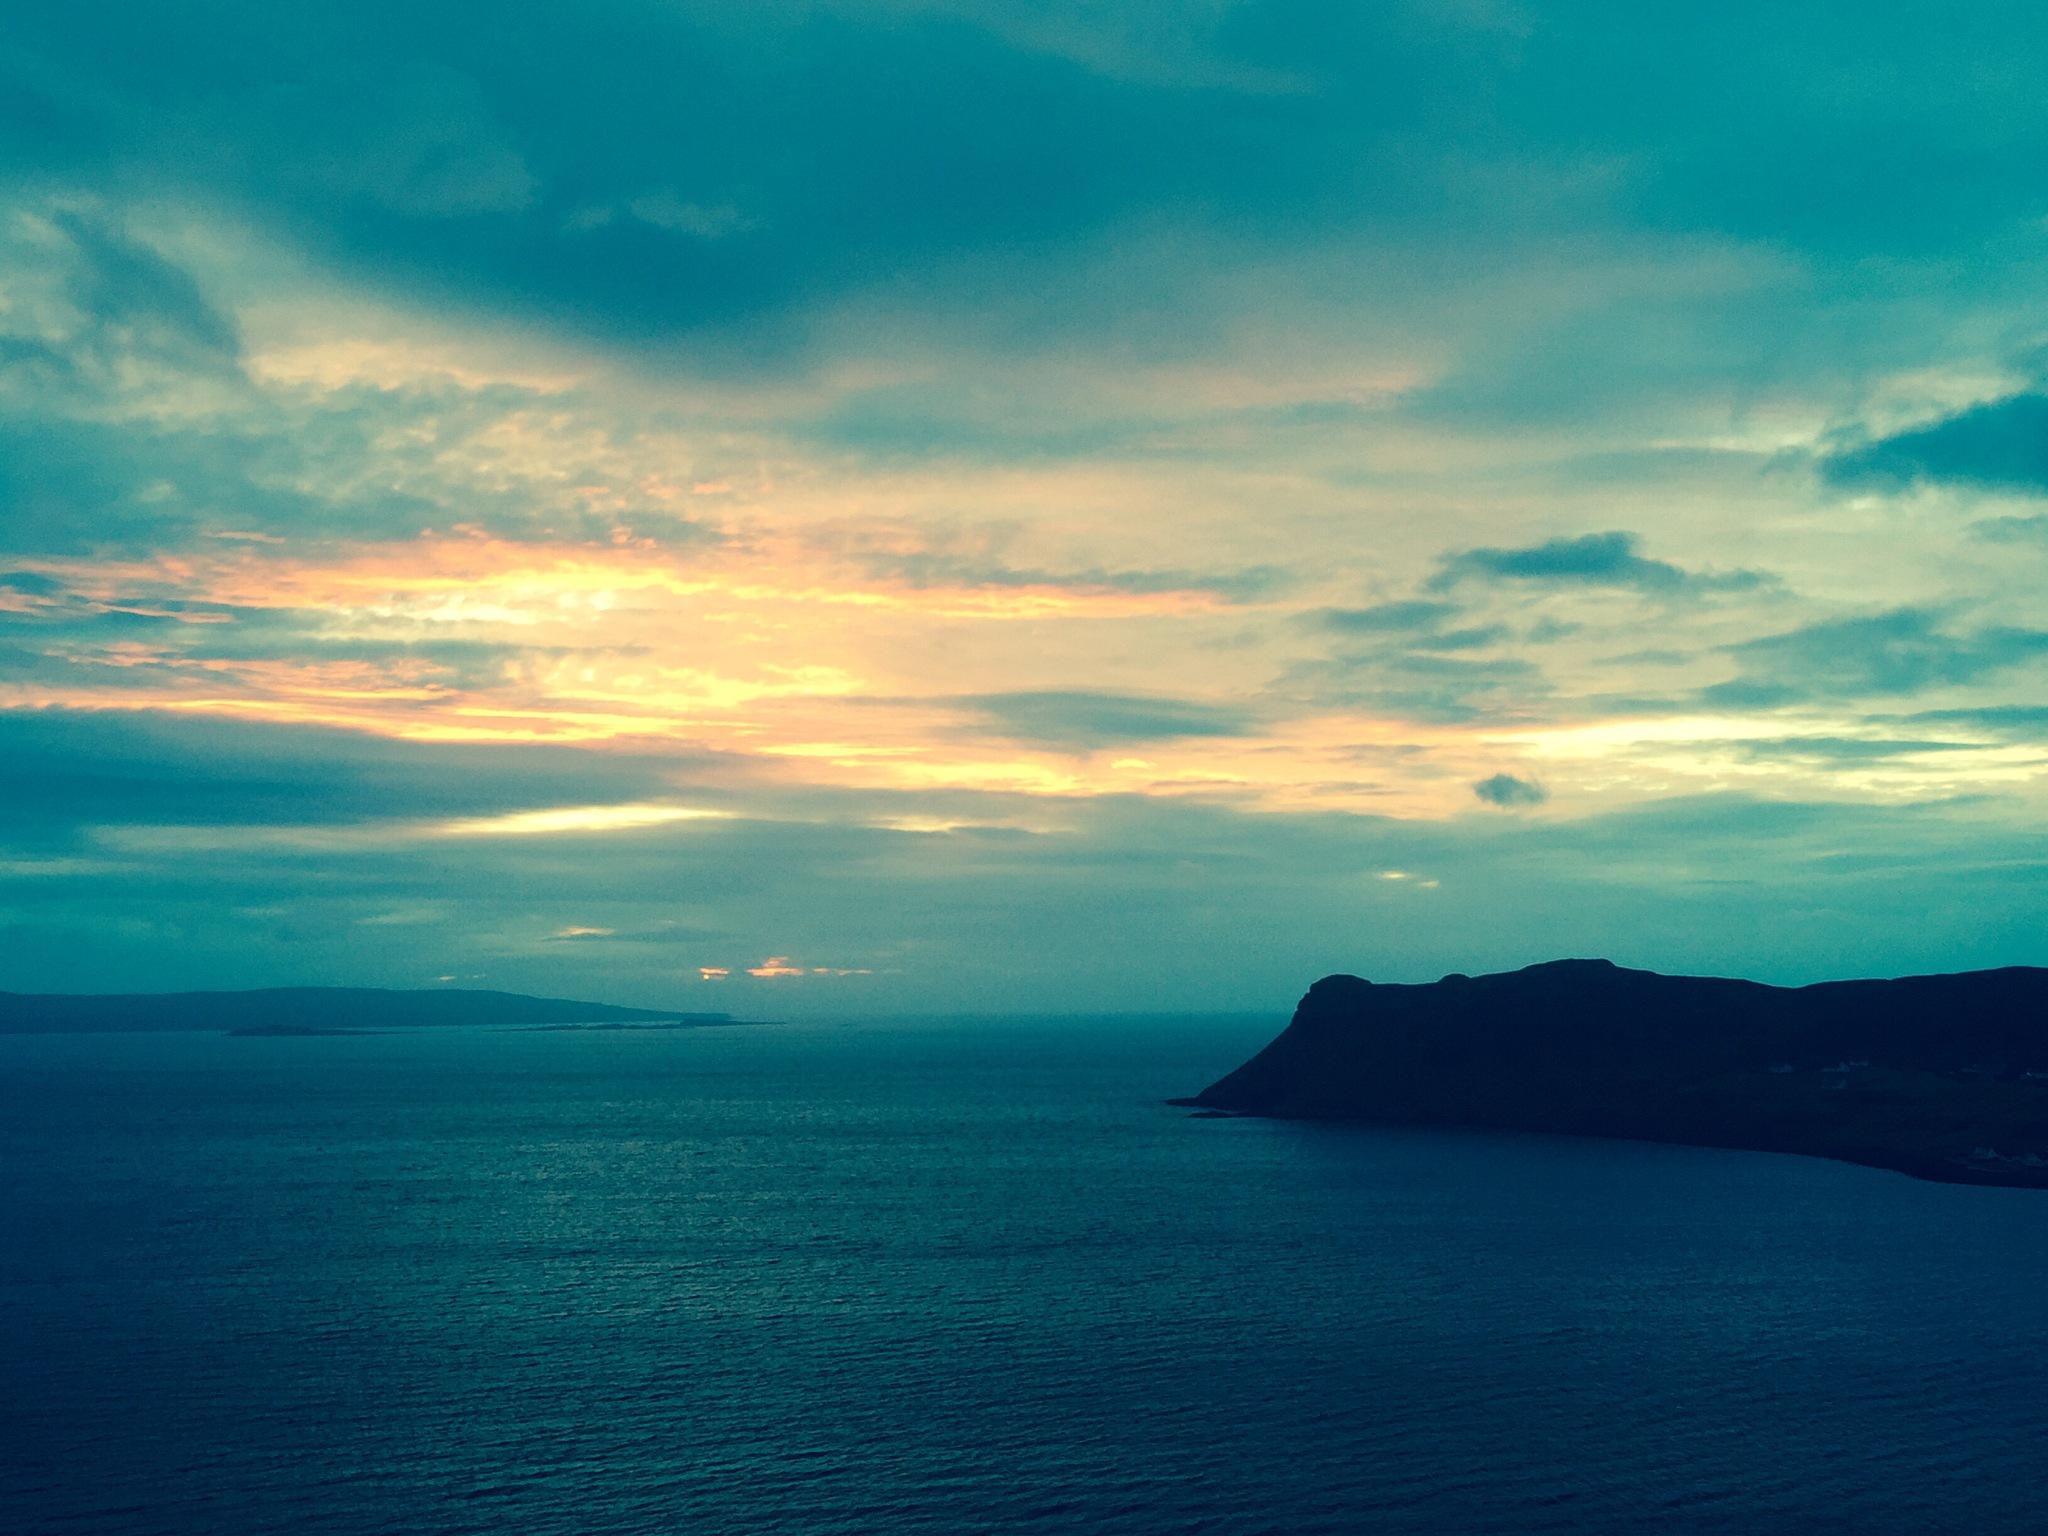 Sunrise on Skye by Kingshillmac